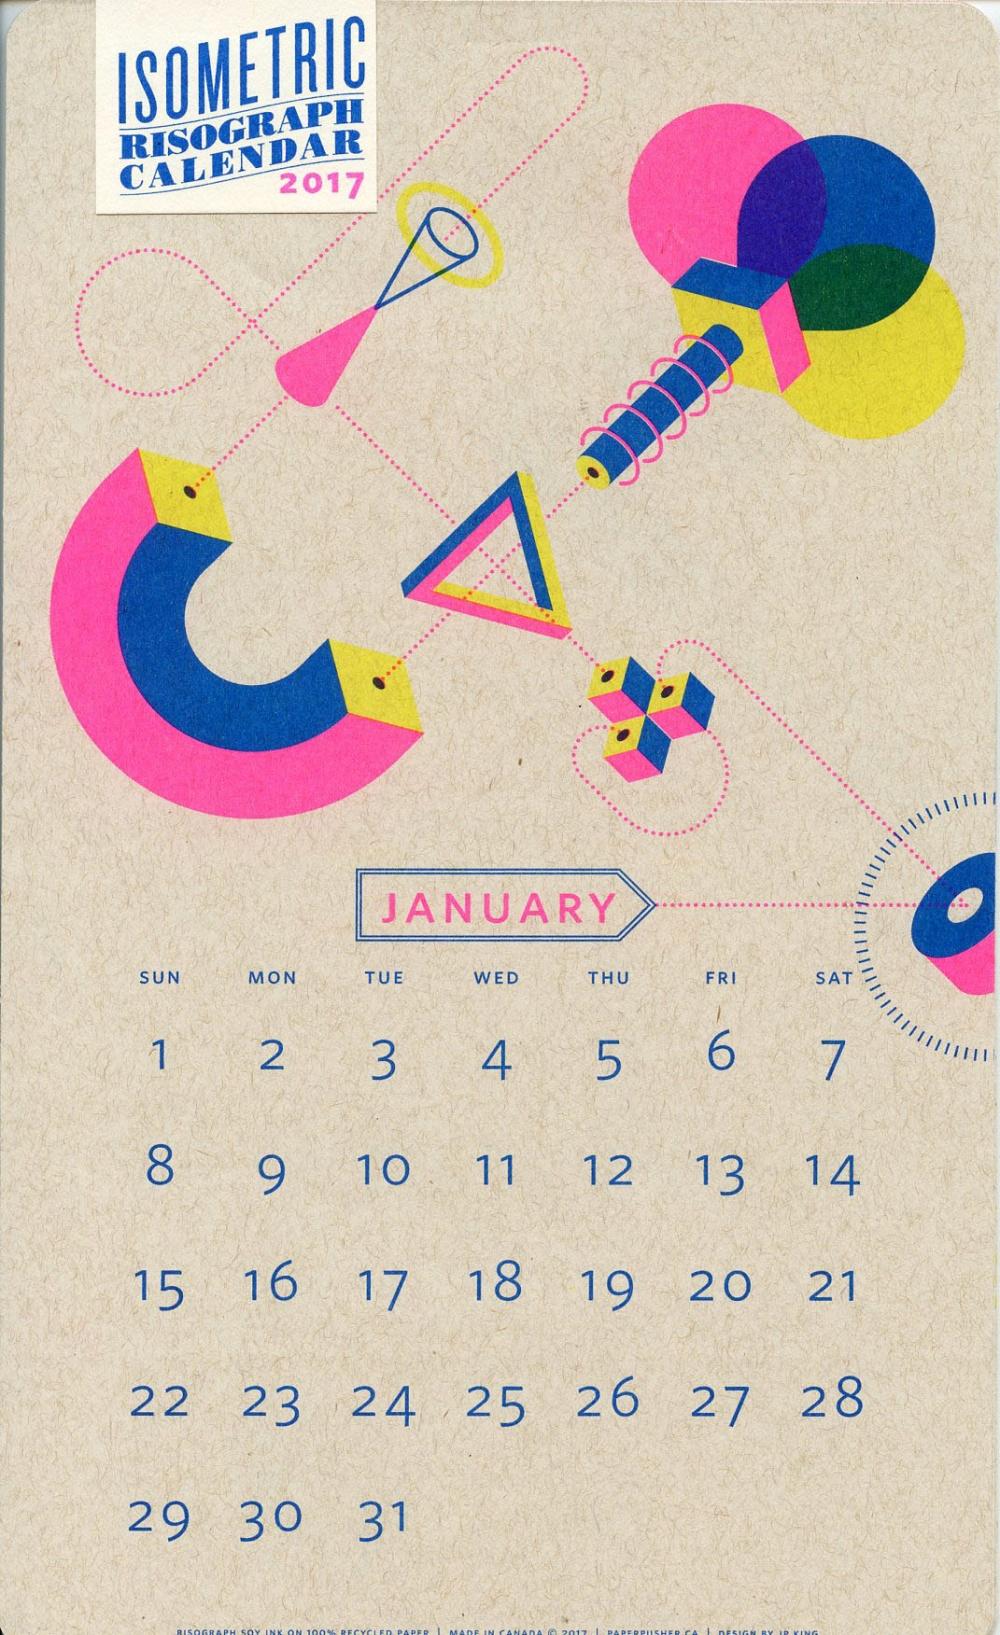 Isometric Risograph Calendar - 2017